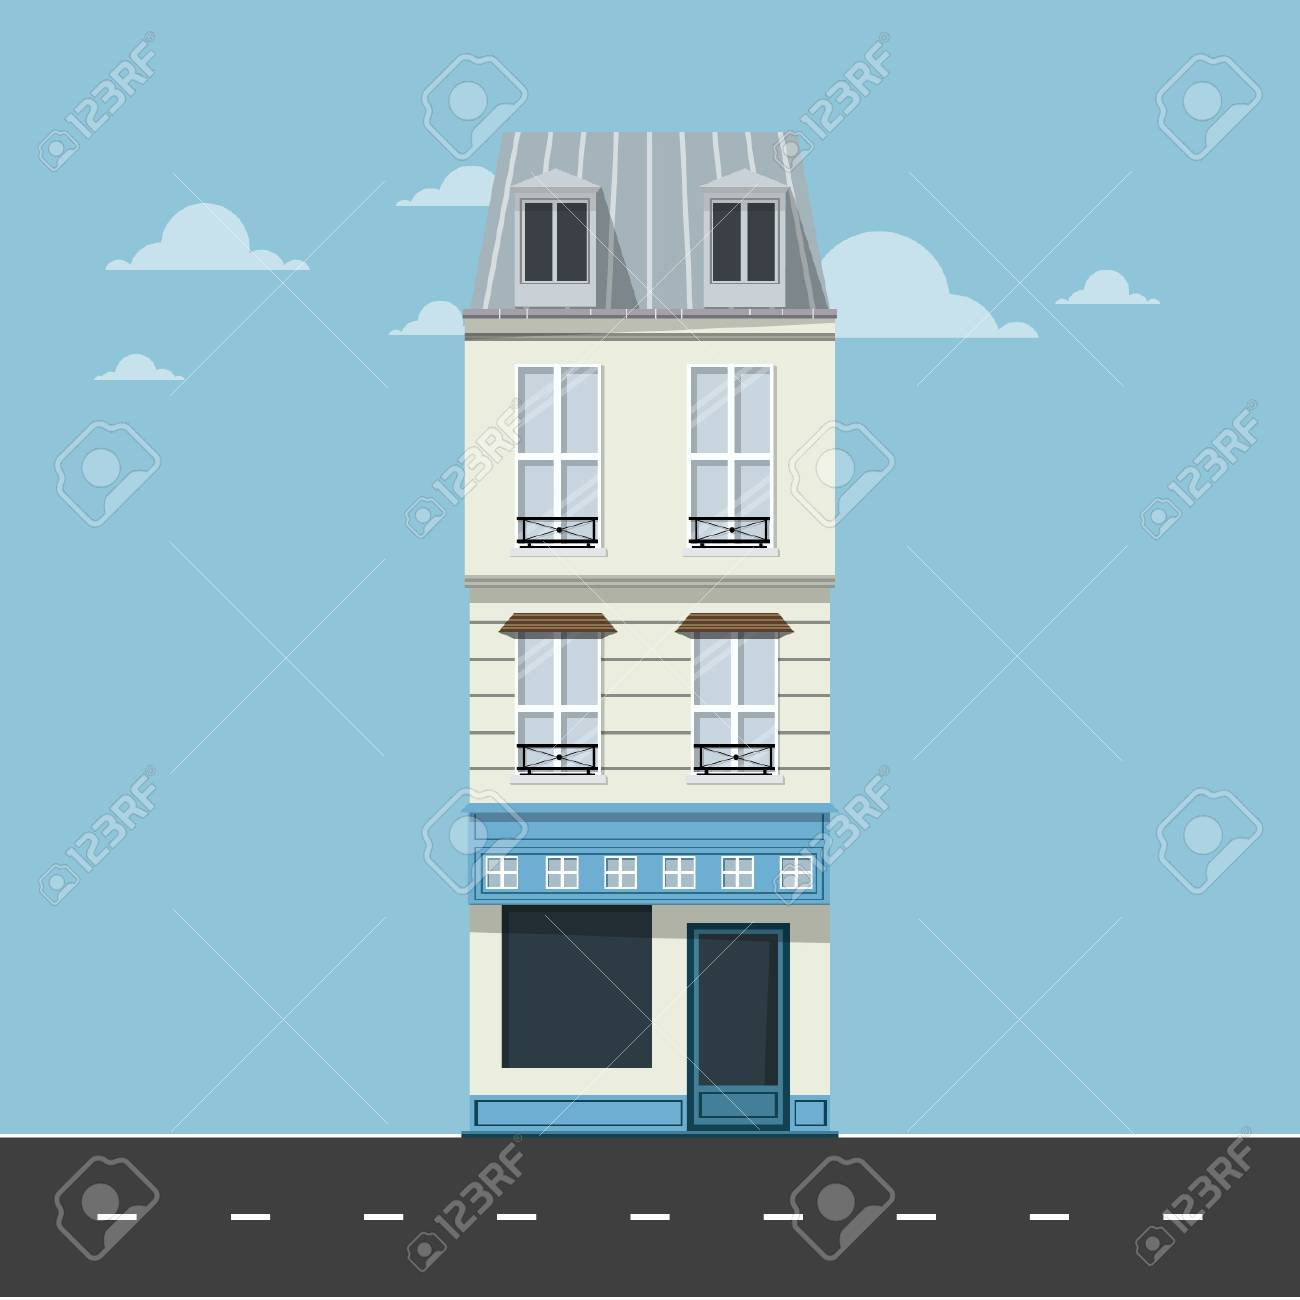 Apartment - Minimal Building Vector - 110619482